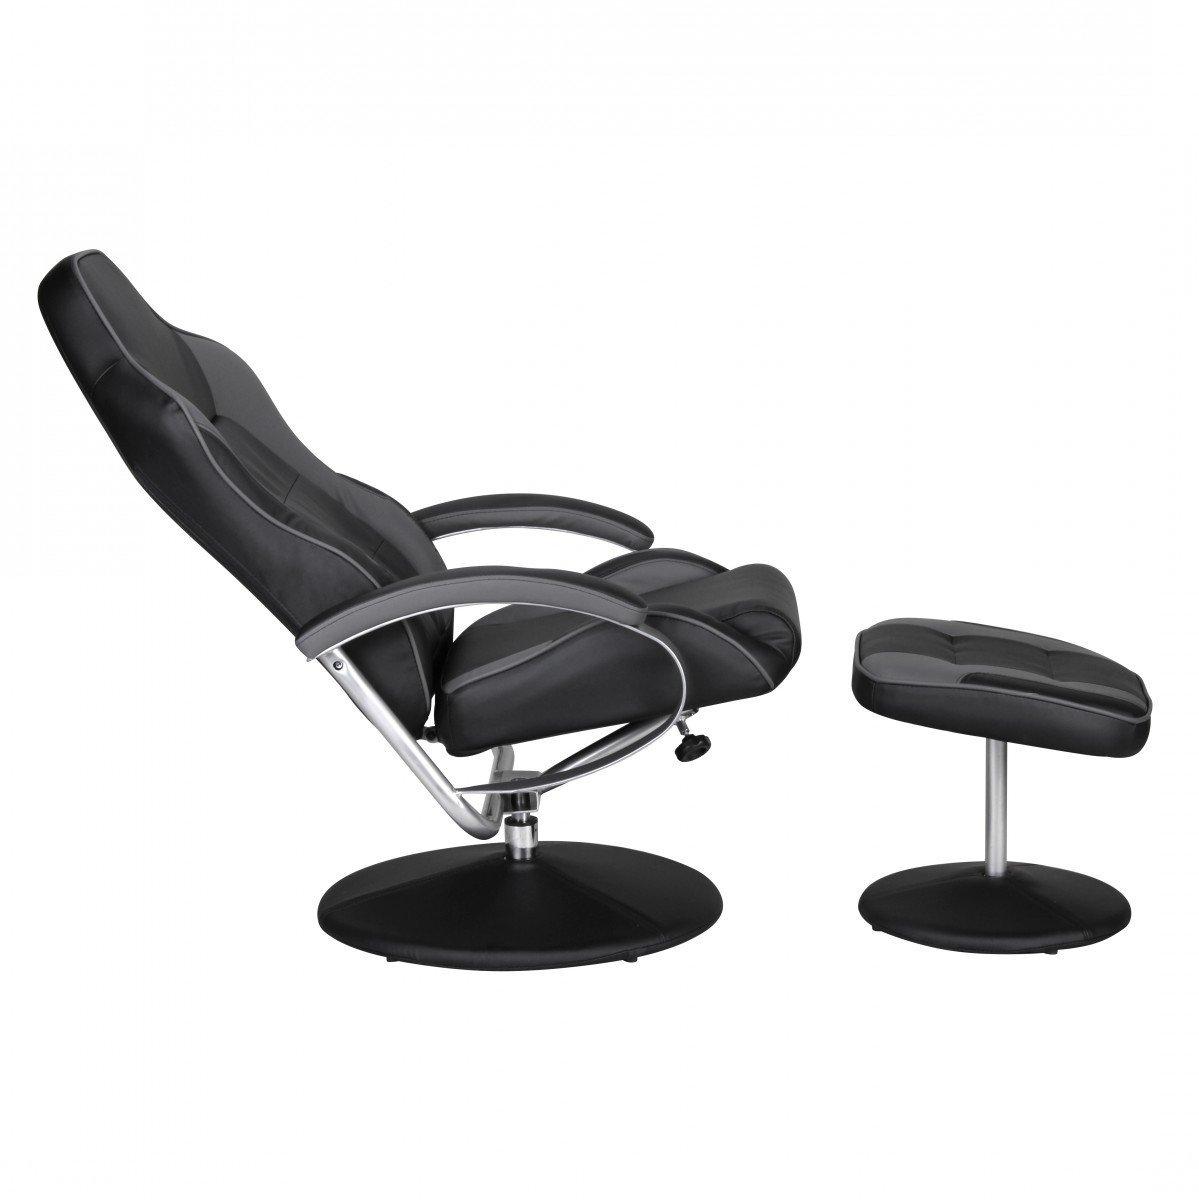 Tv sessel design  Amstyle Sporting TV Fernseh-/Relax-Sessel drehbar mit Hocker ...